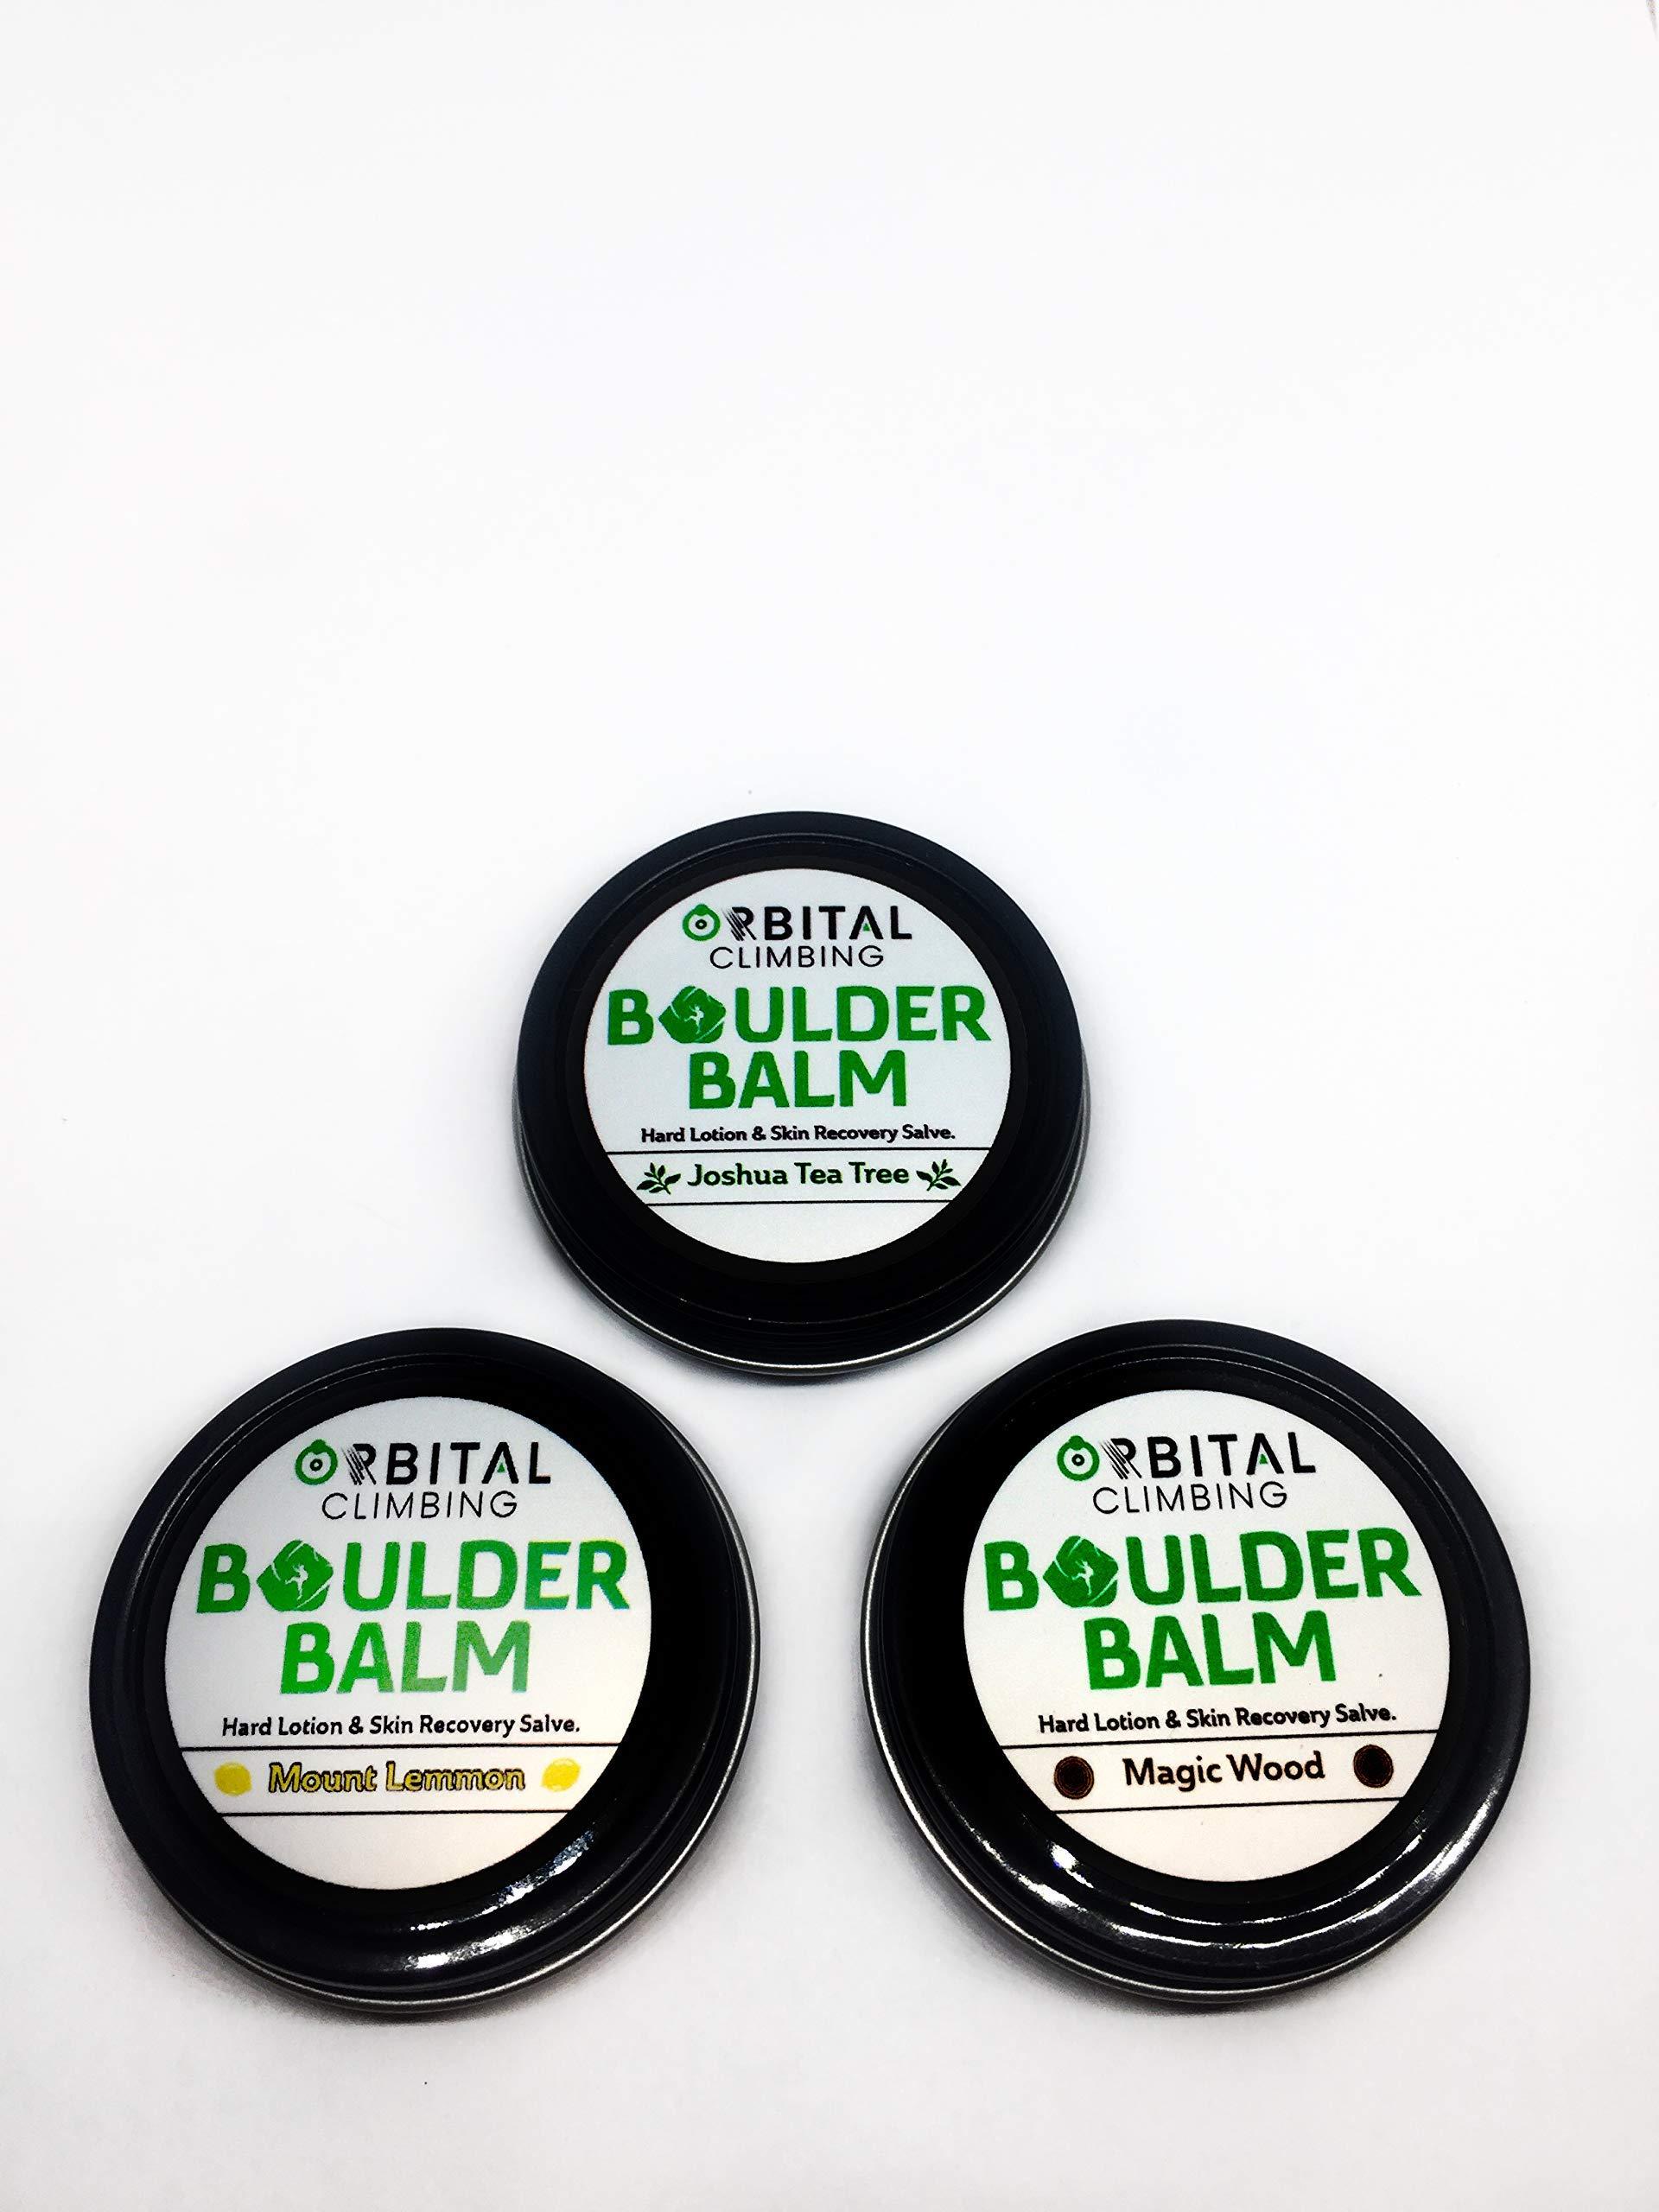 Boulder Balm: Hard Lotion Skin Recovery Salve 3 Pack! (Joshua Tea Tree, Mount Lemmon, Magic Wood Scent)